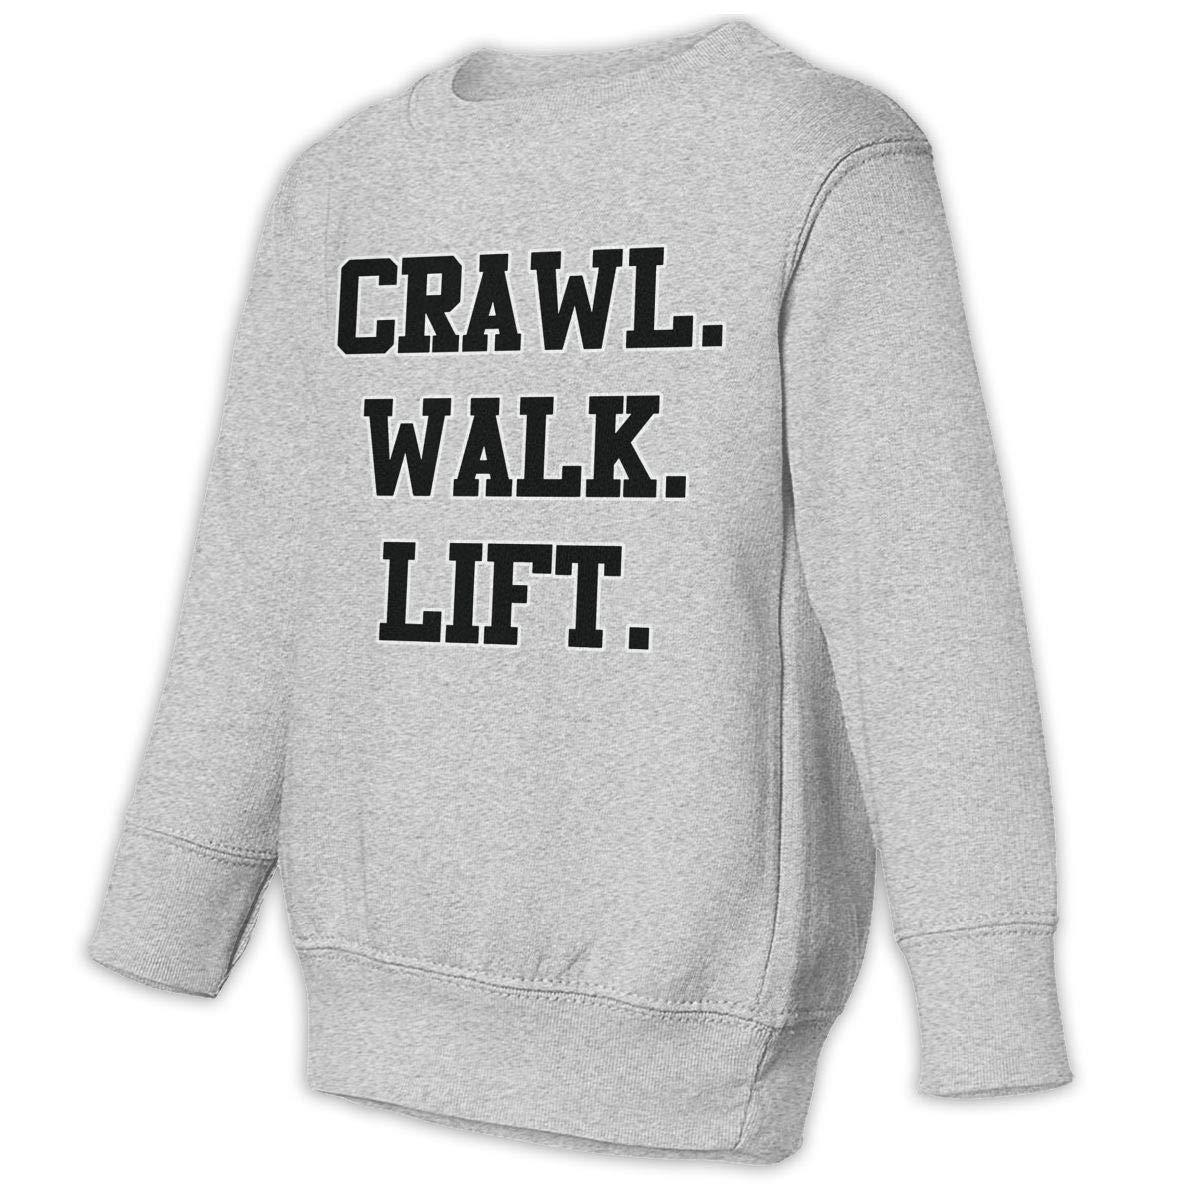 Crawl Walk Lift Baby Sweatshirt Stylish Kids Hoodies Soft Pullovers